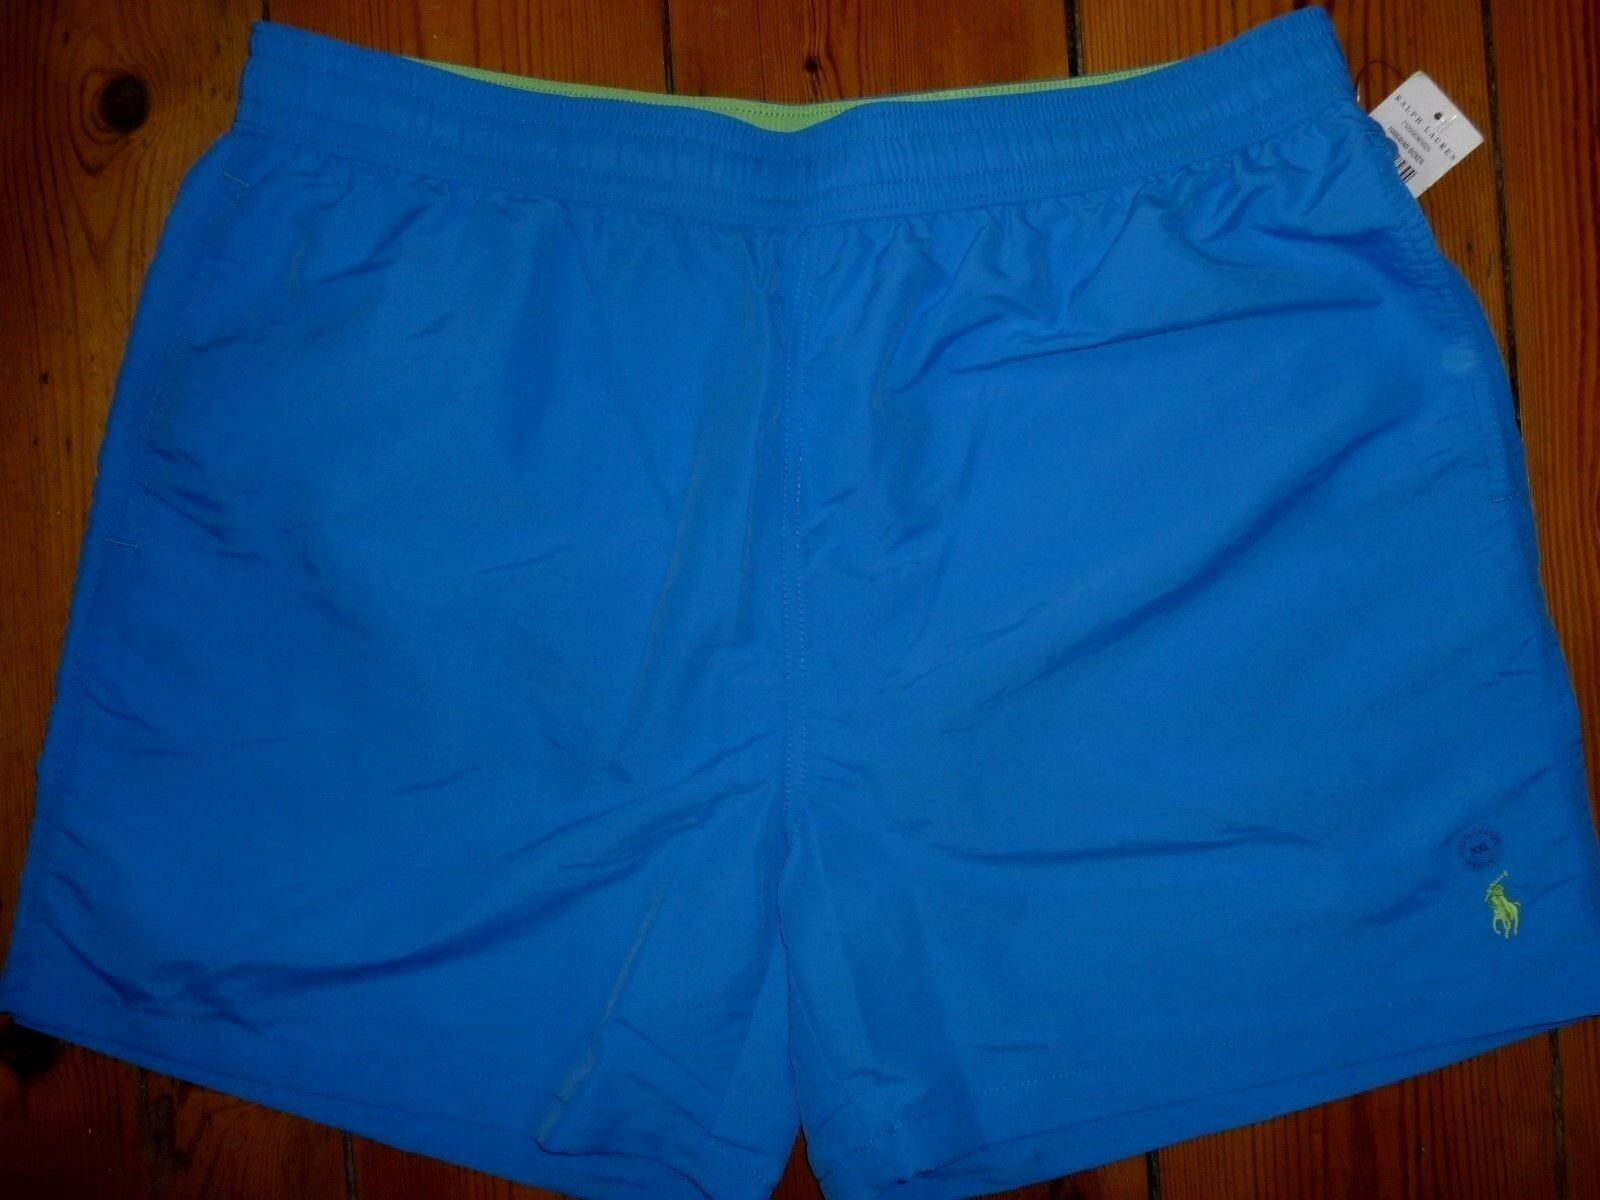 MENS RALPH LAUREN SWIM SHORTS HAWAIIAN BOXER JEWEL blueE XXL 2XL WAIST 38 - 40IN